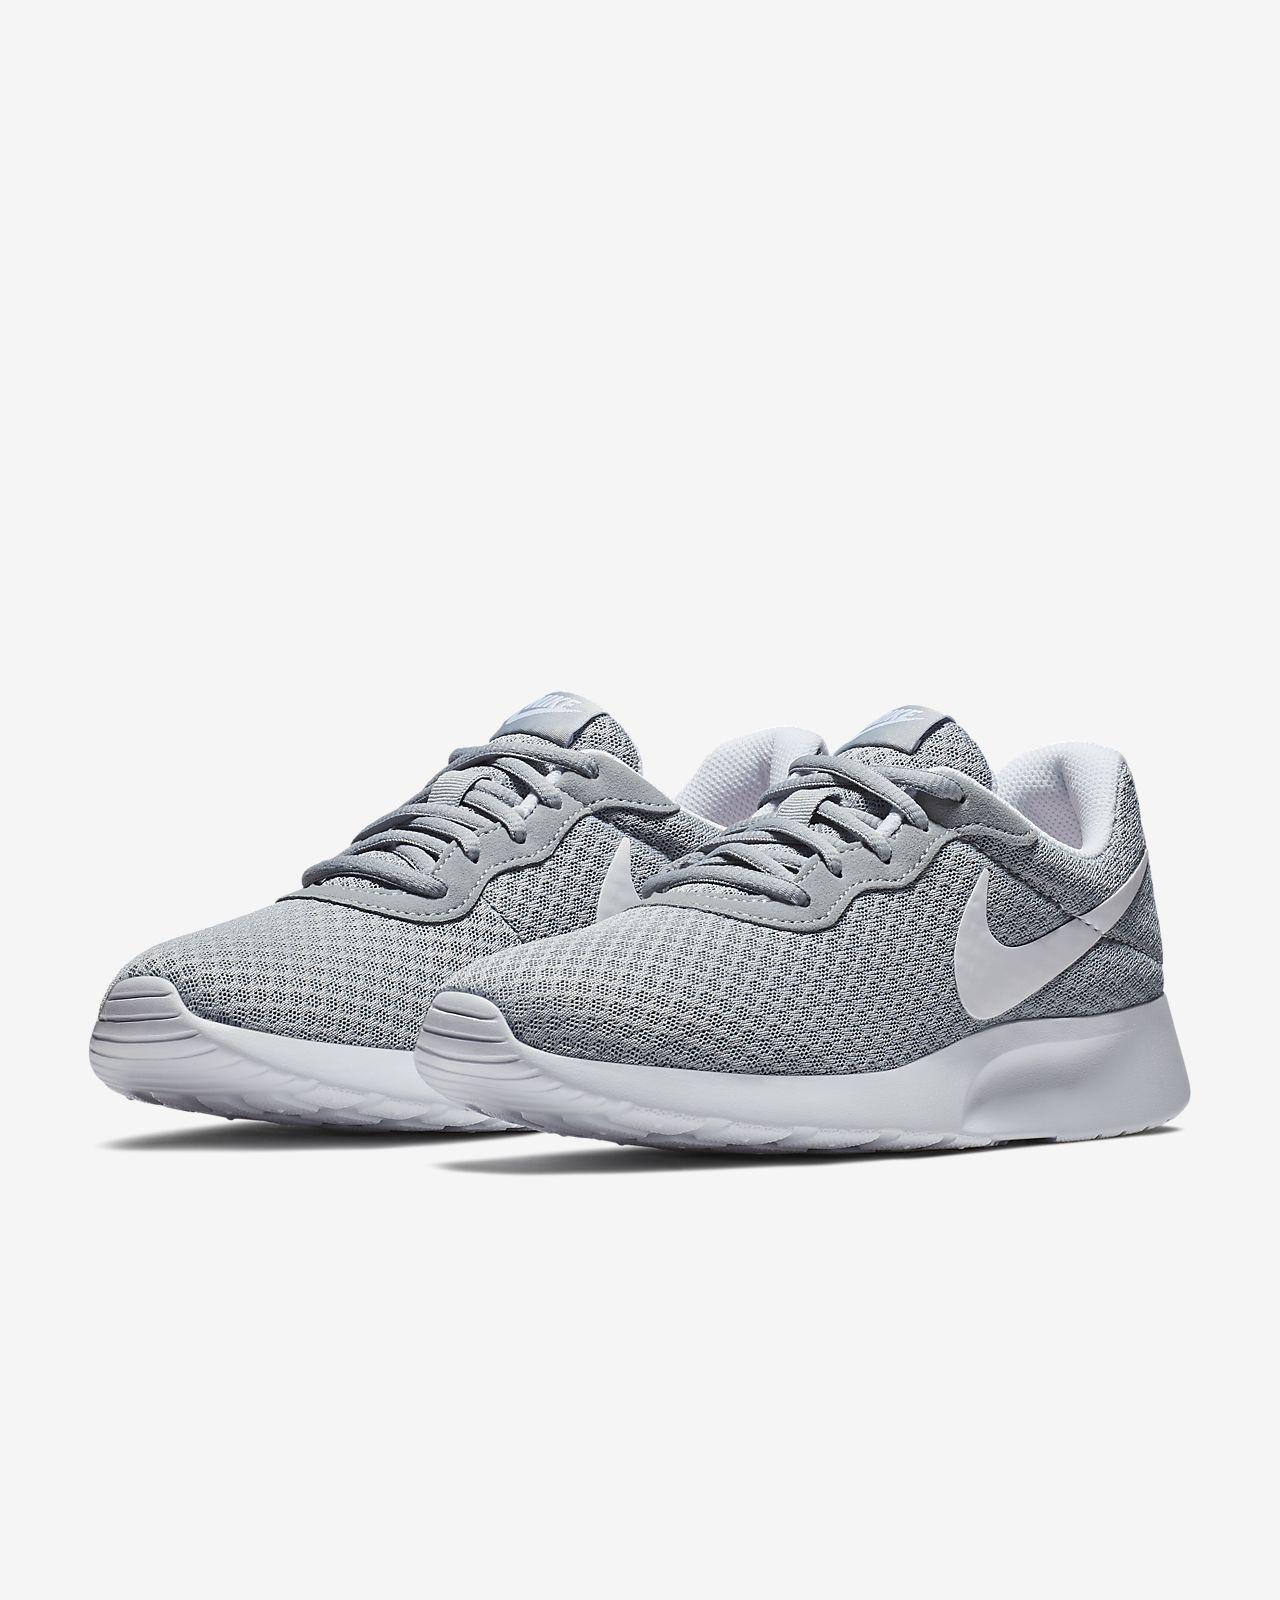 best loved fad46 c2de1 ... Chaussure Nike Tanjun pour Femme